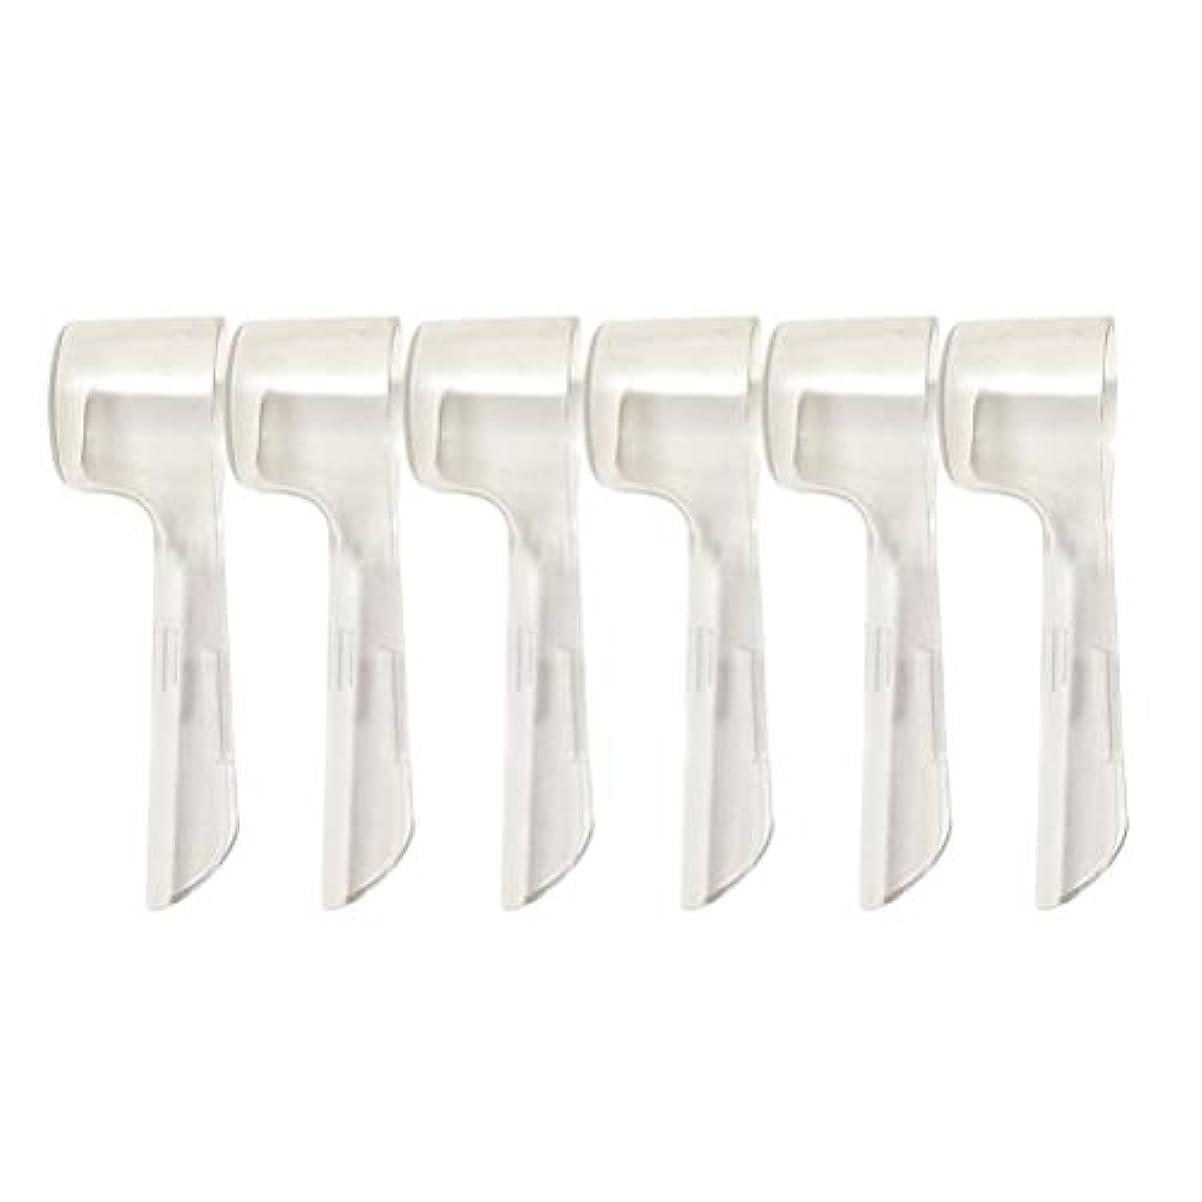 Healifty 電動歯ブラシヘッド 保護カバー 旅行 キャップ 日常の使用で細菌をほこりから守る 10ピース